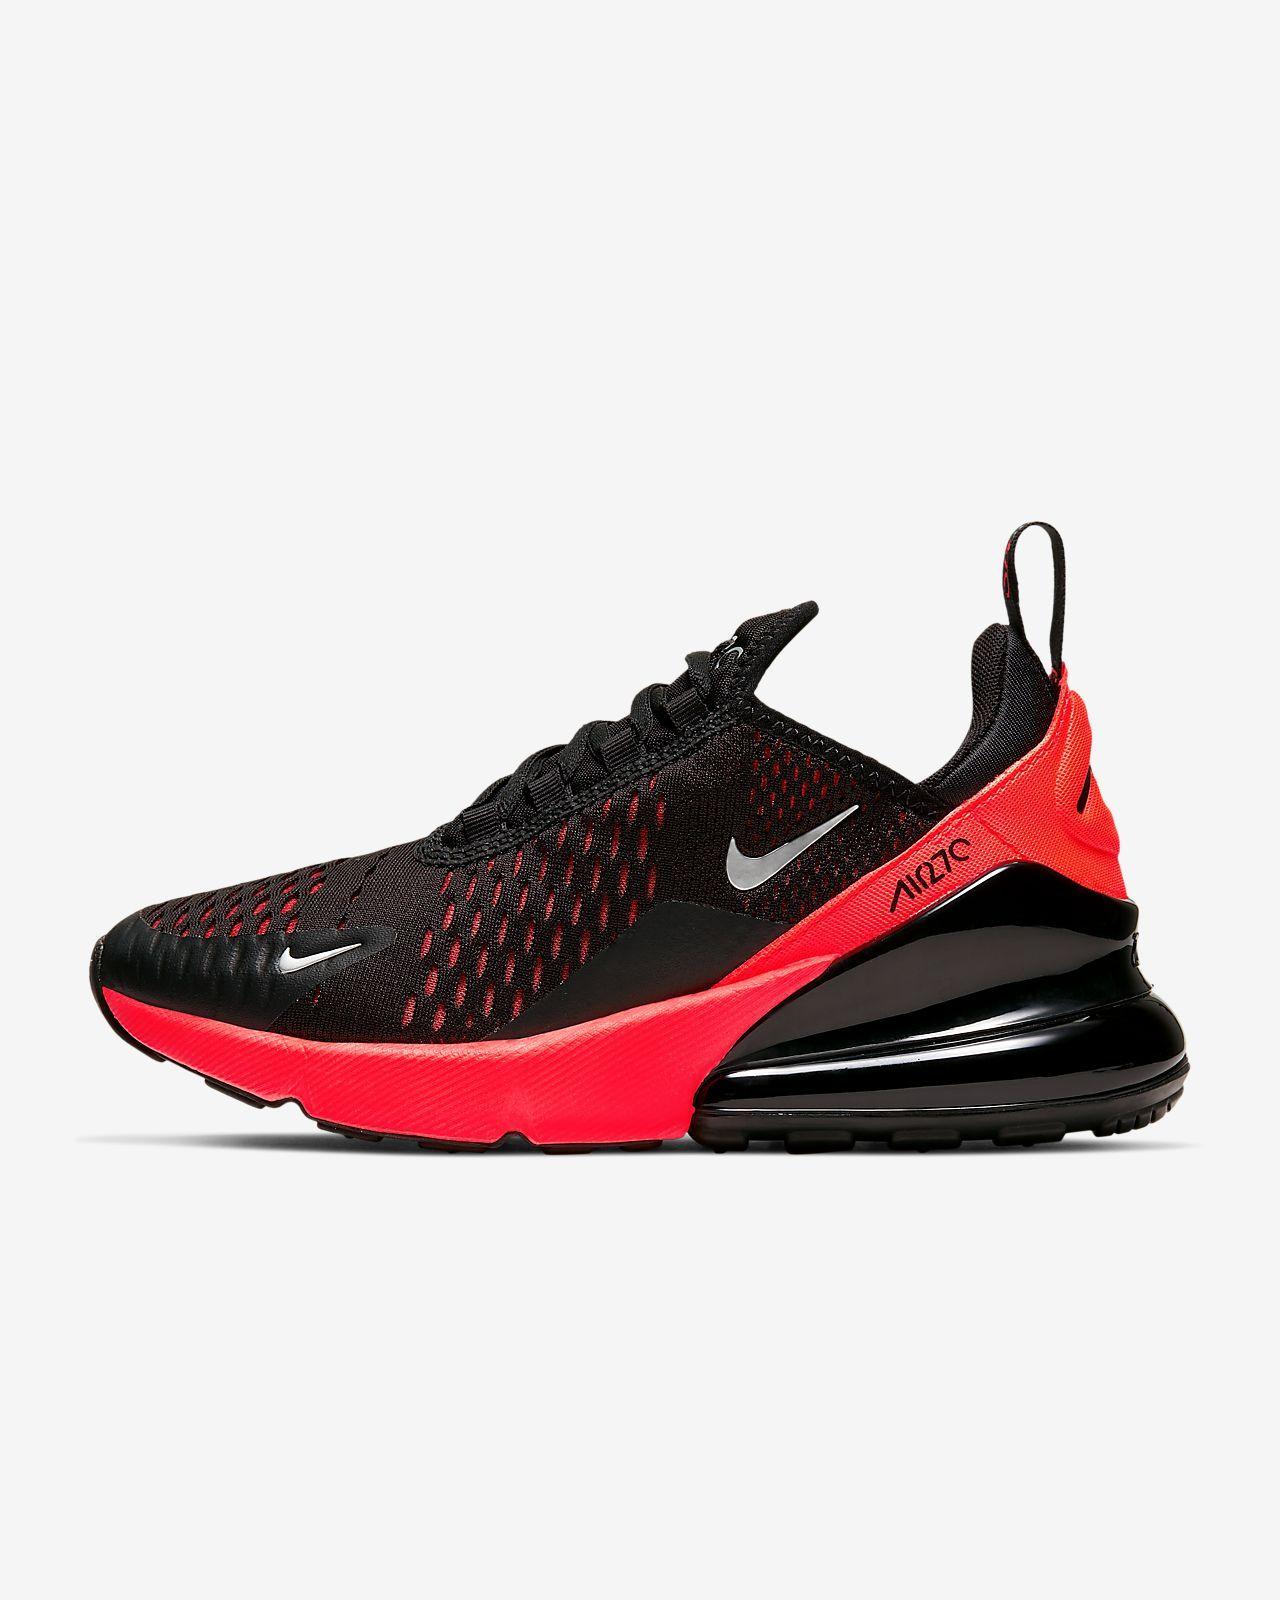 Nike Air Max 270 Big Kids' Shoe. Nike